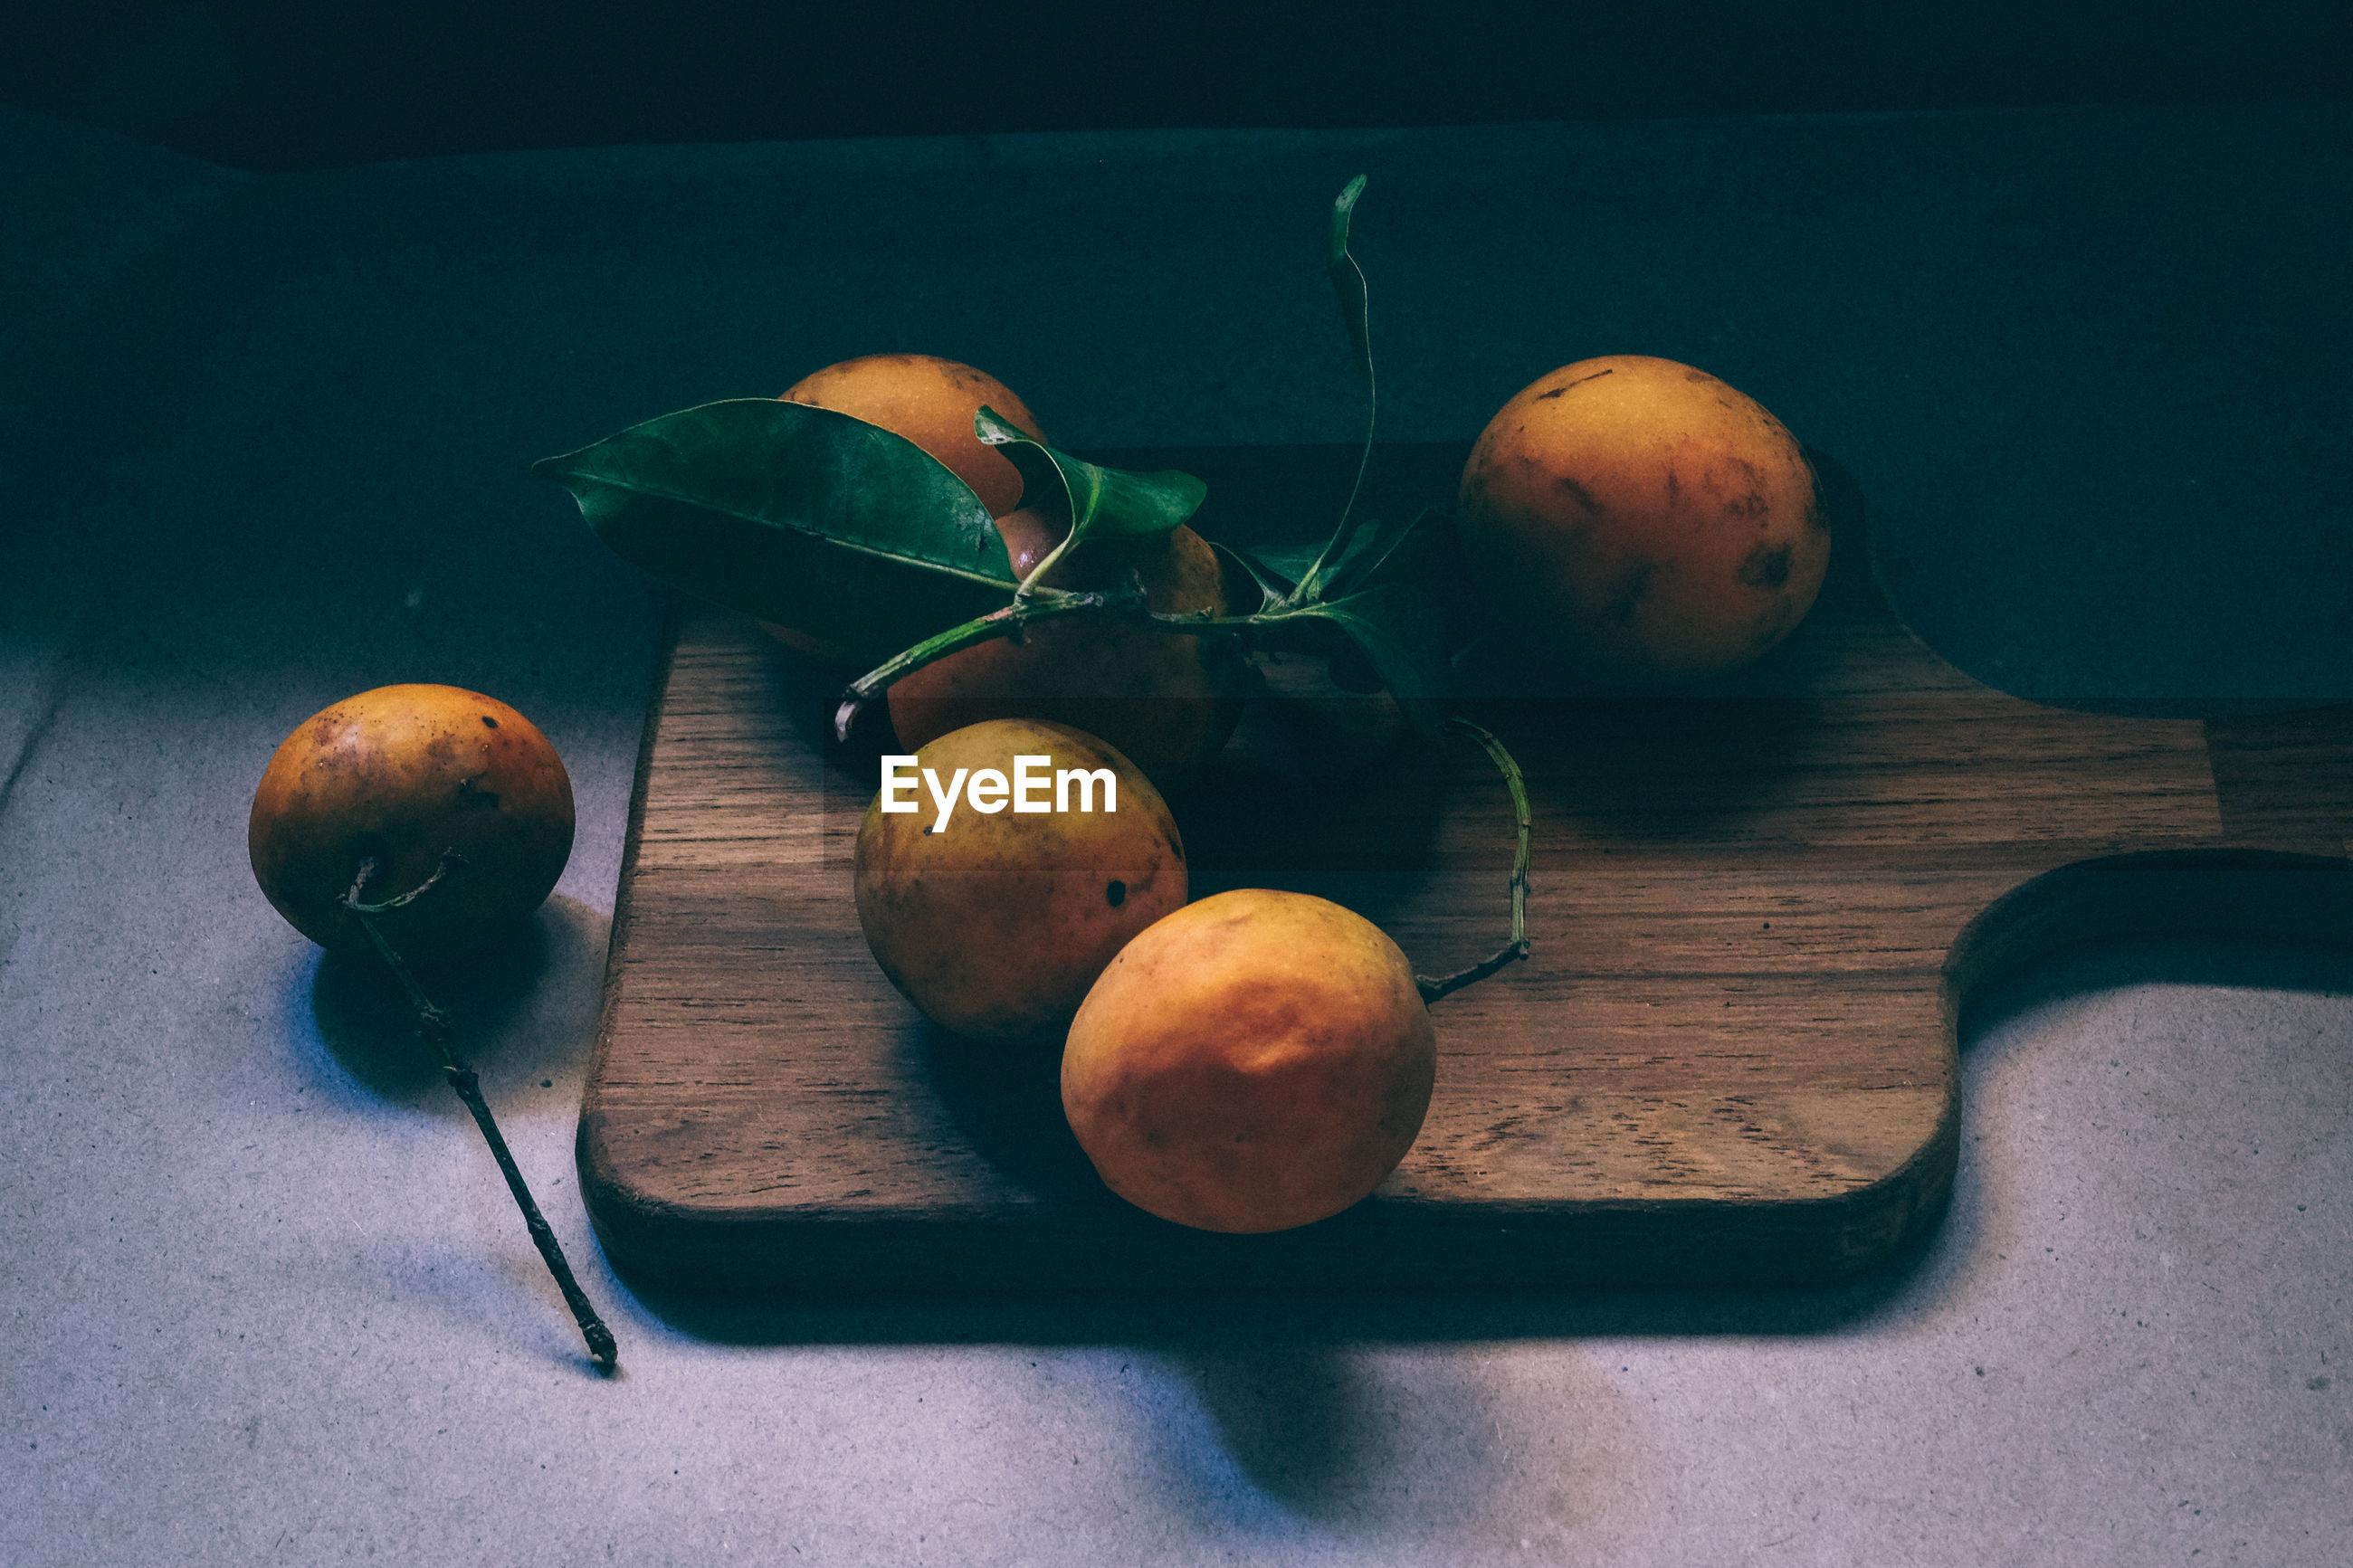 High angle view of lemons on cutting board